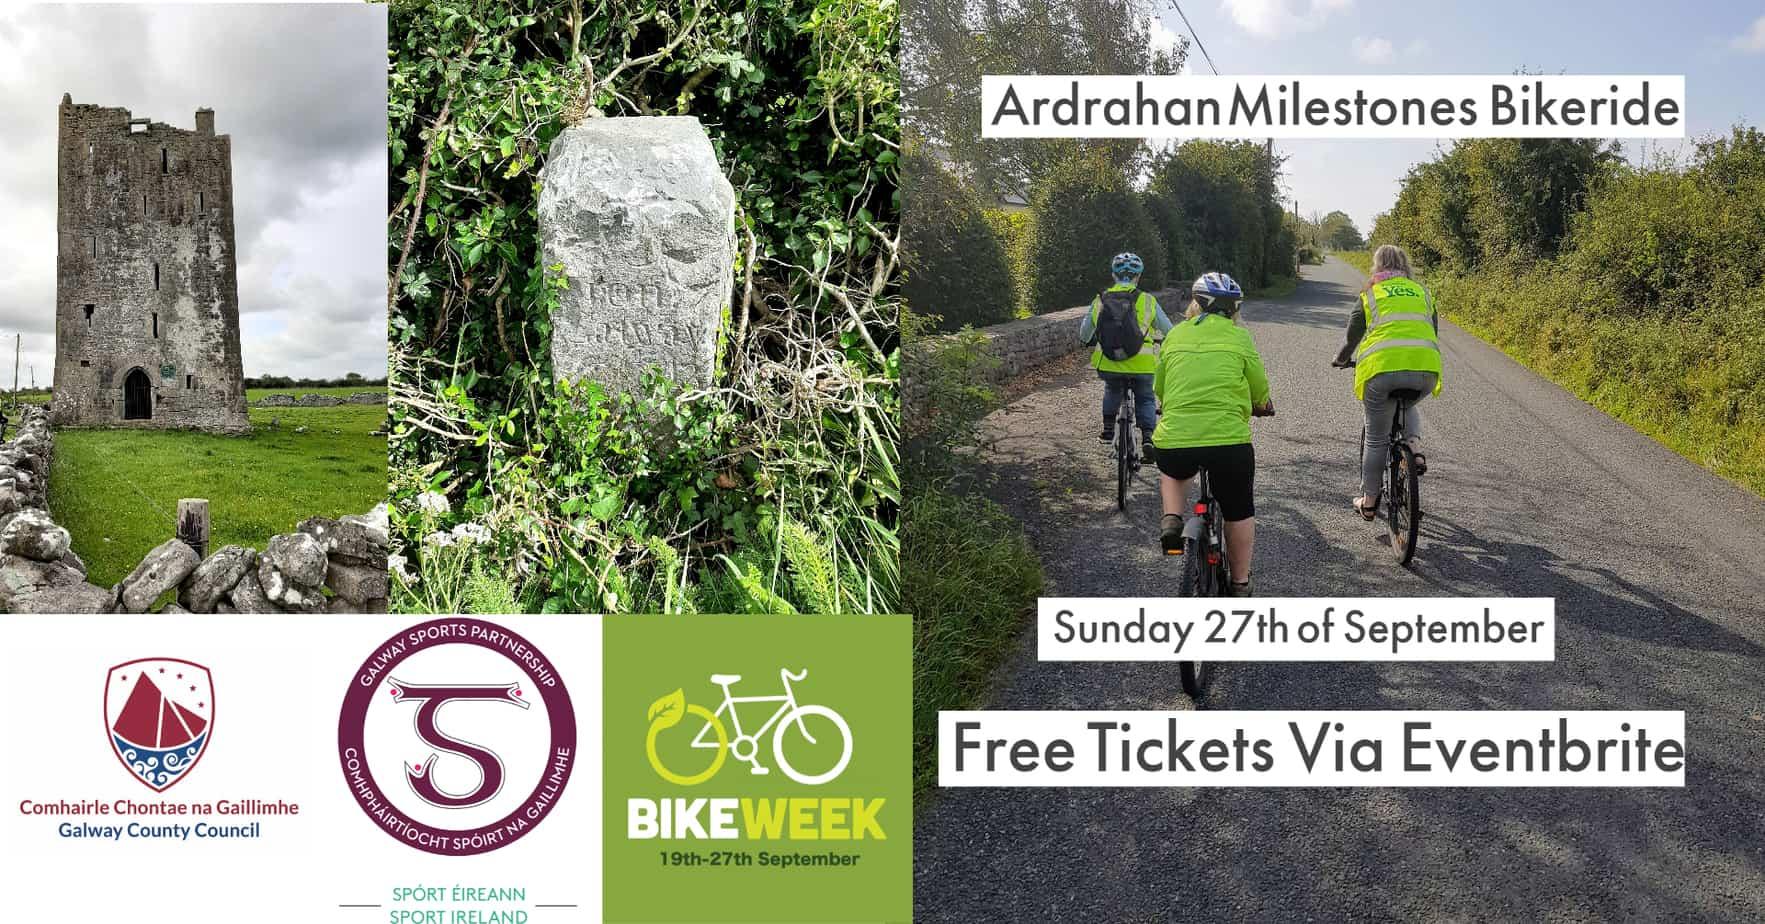 Ardrahan Old Milestone Bike Ride